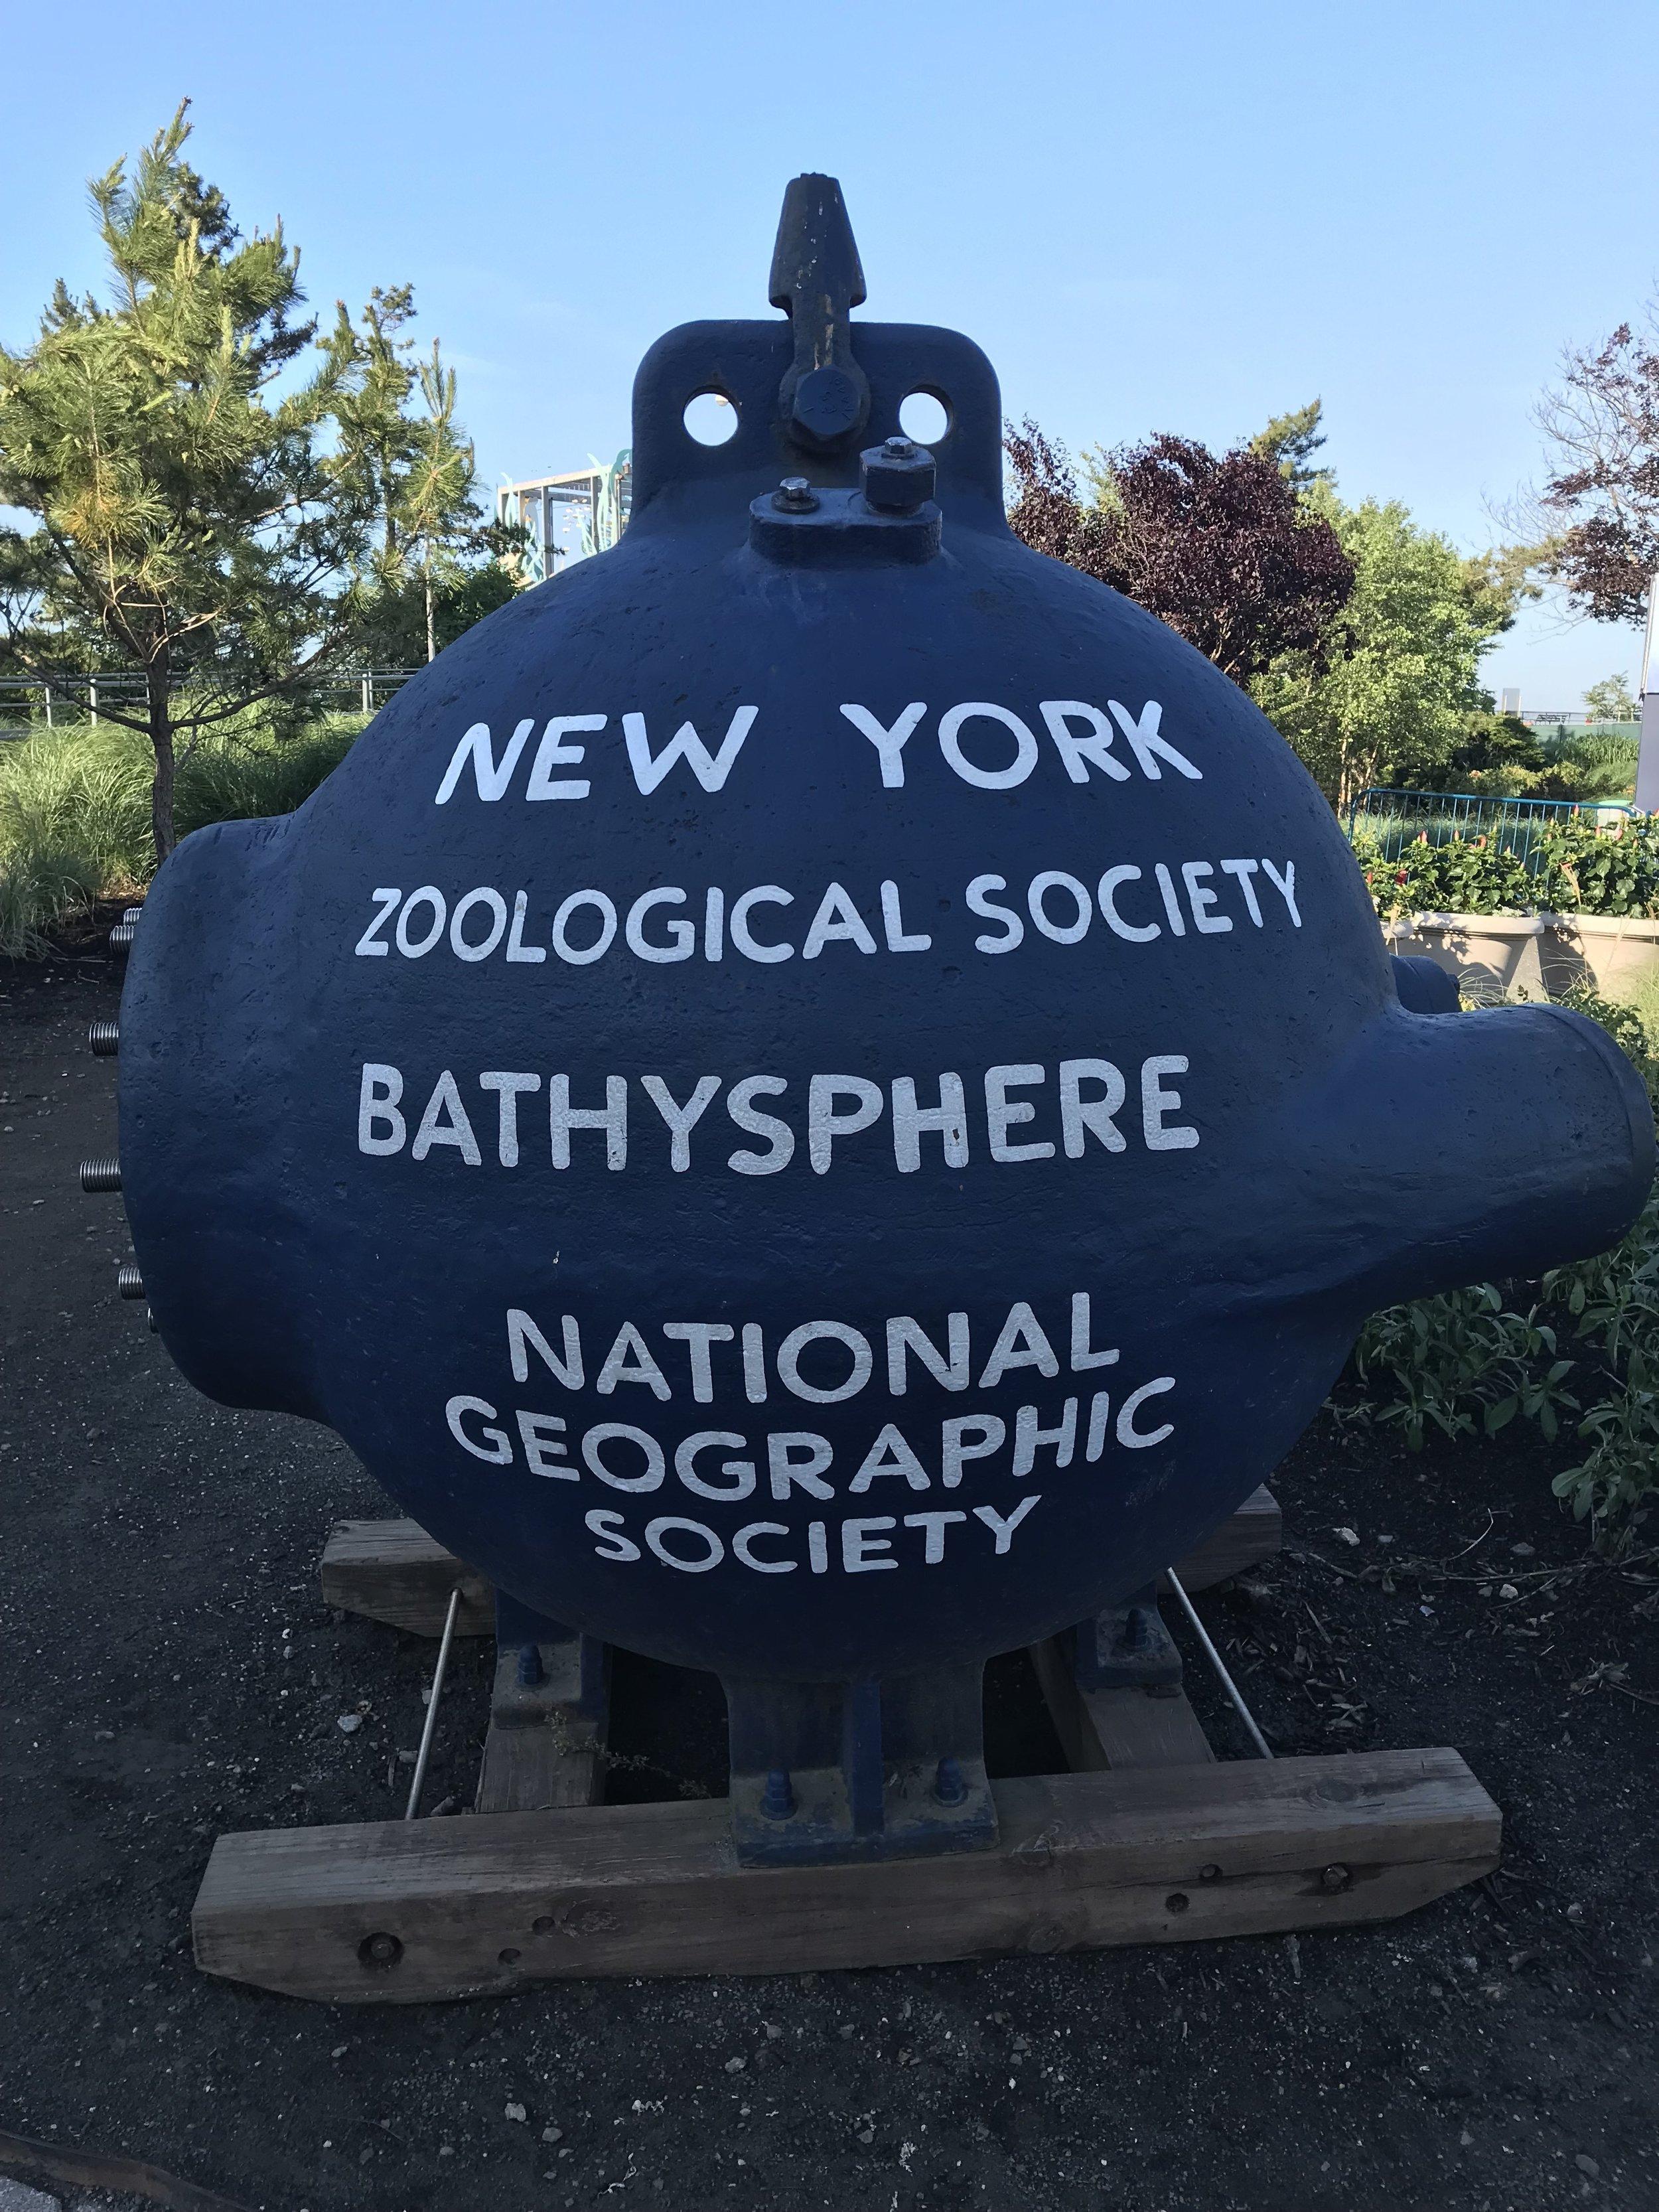 New York Aquarium's History of Exploration